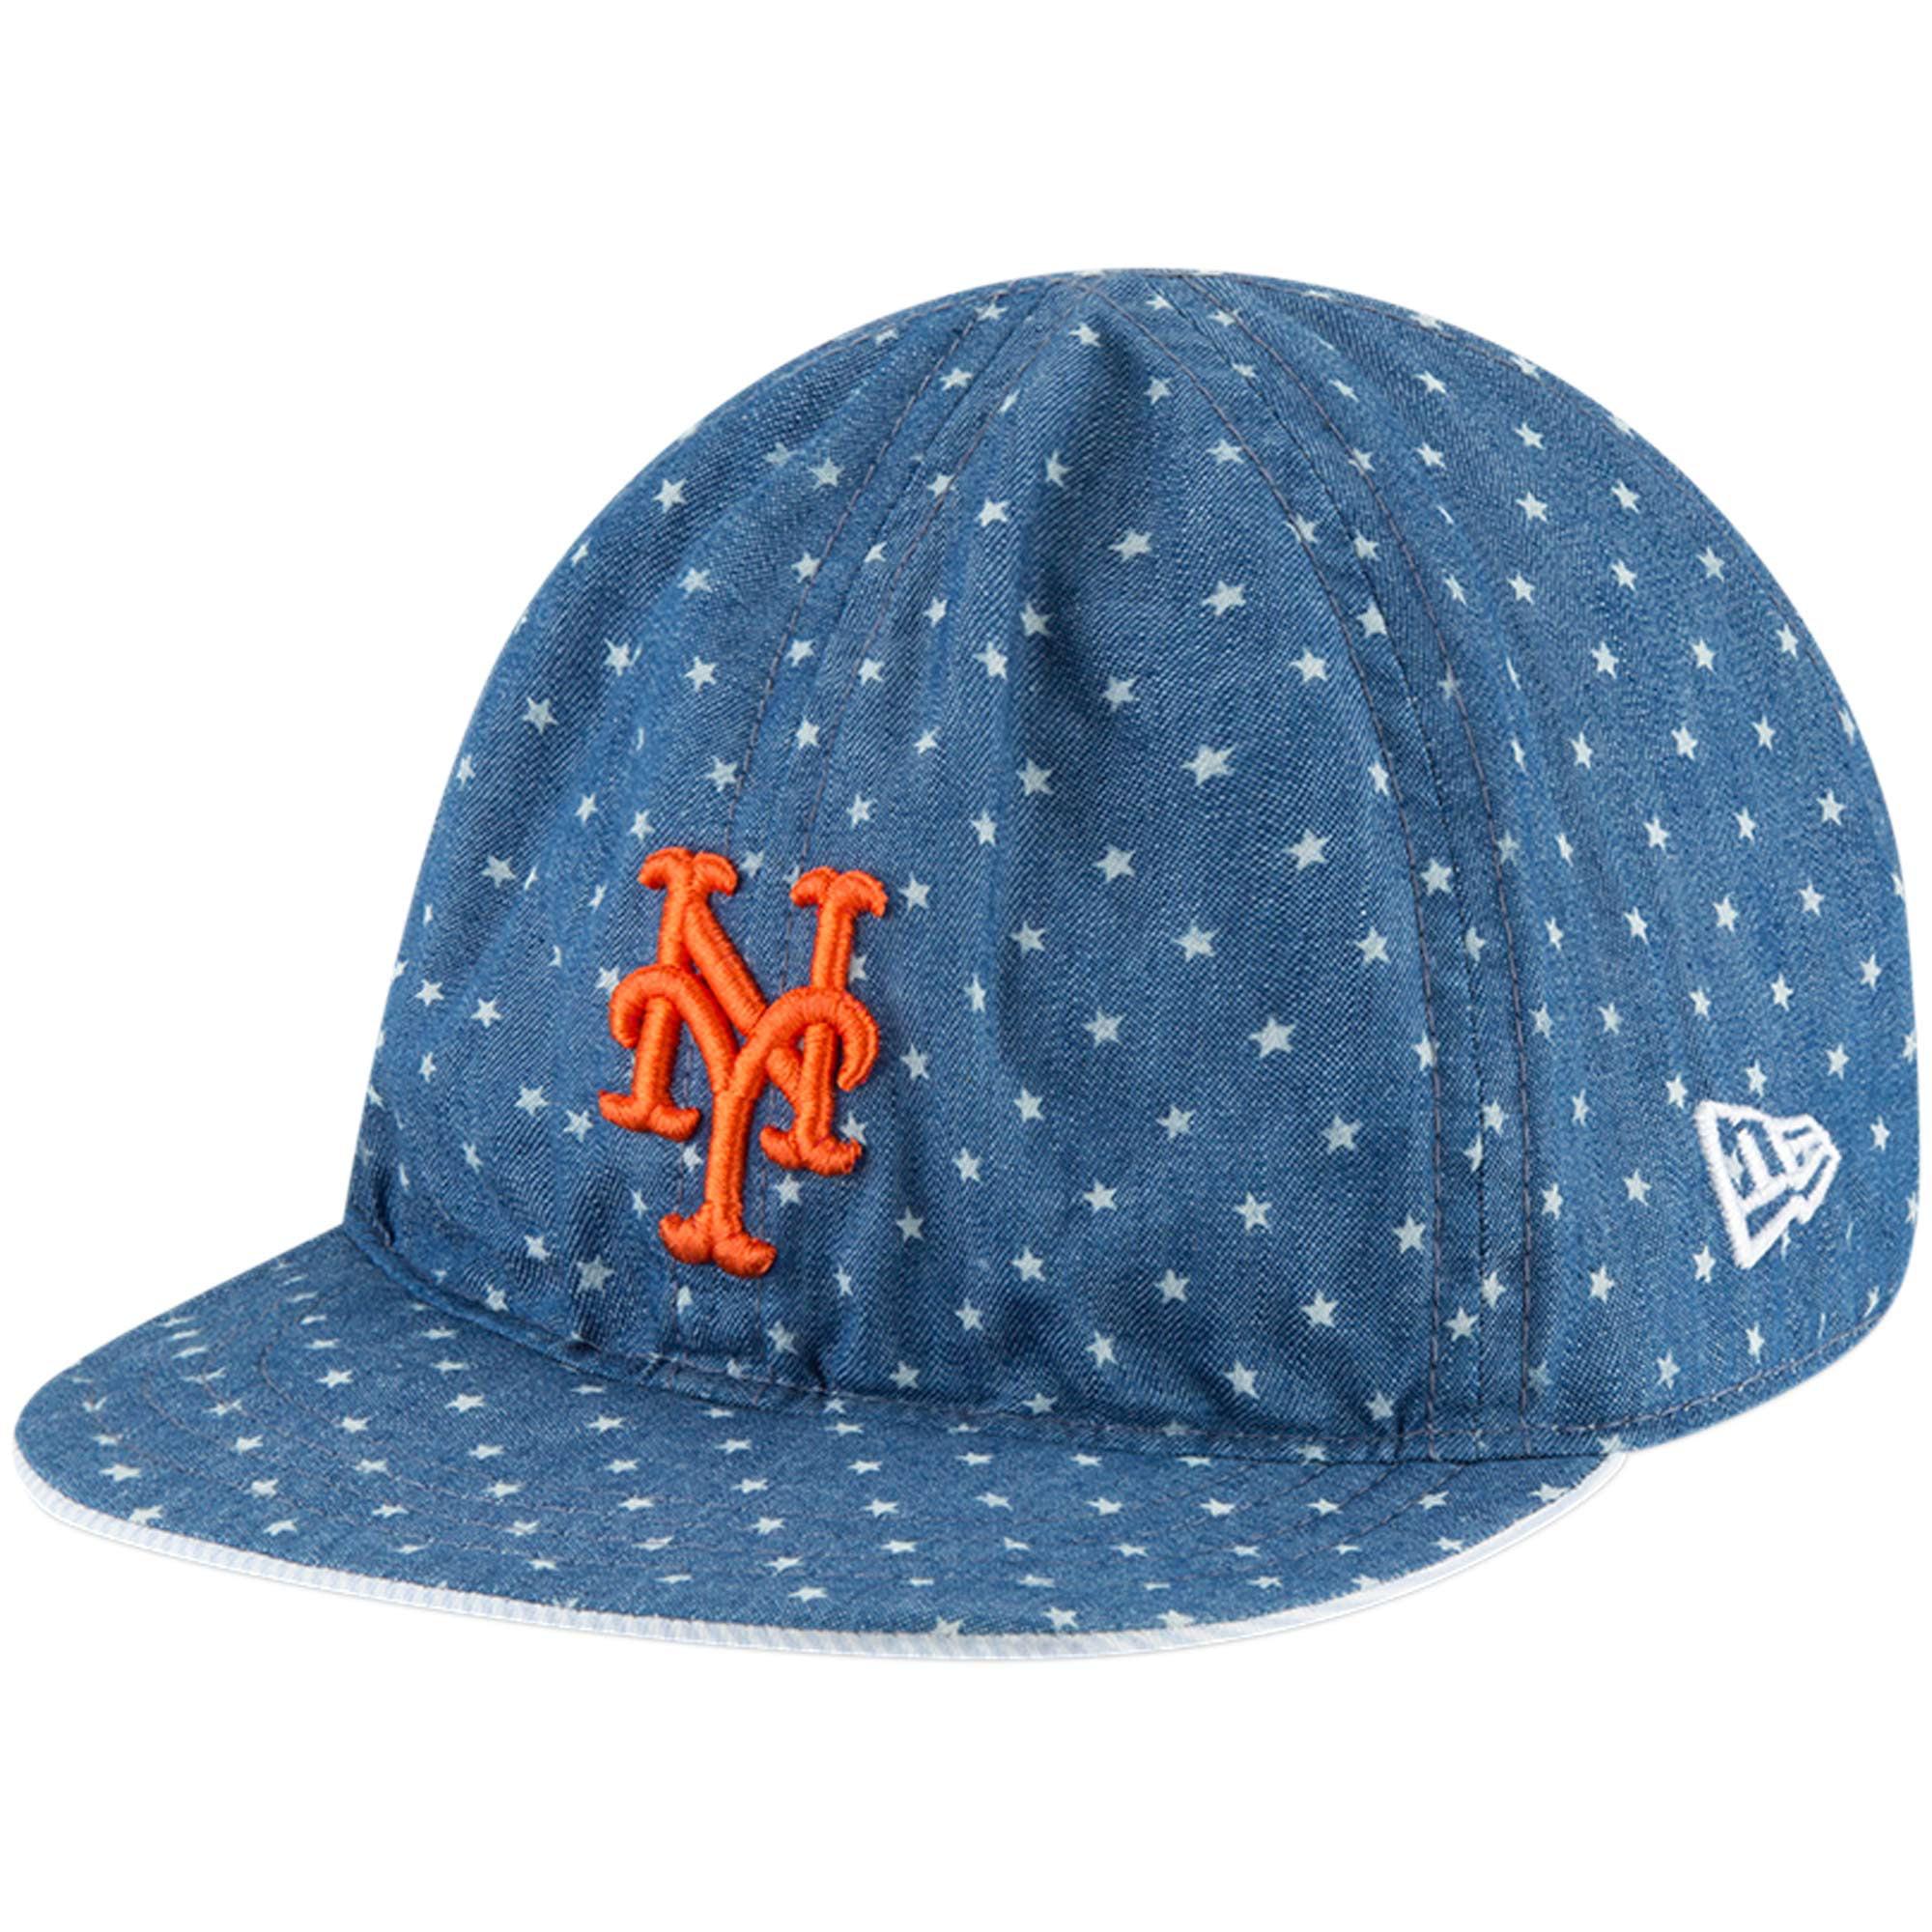 New York Mets New Era Toddler Flip 9TWENTY Adjustable Hat - Denim - OSFA